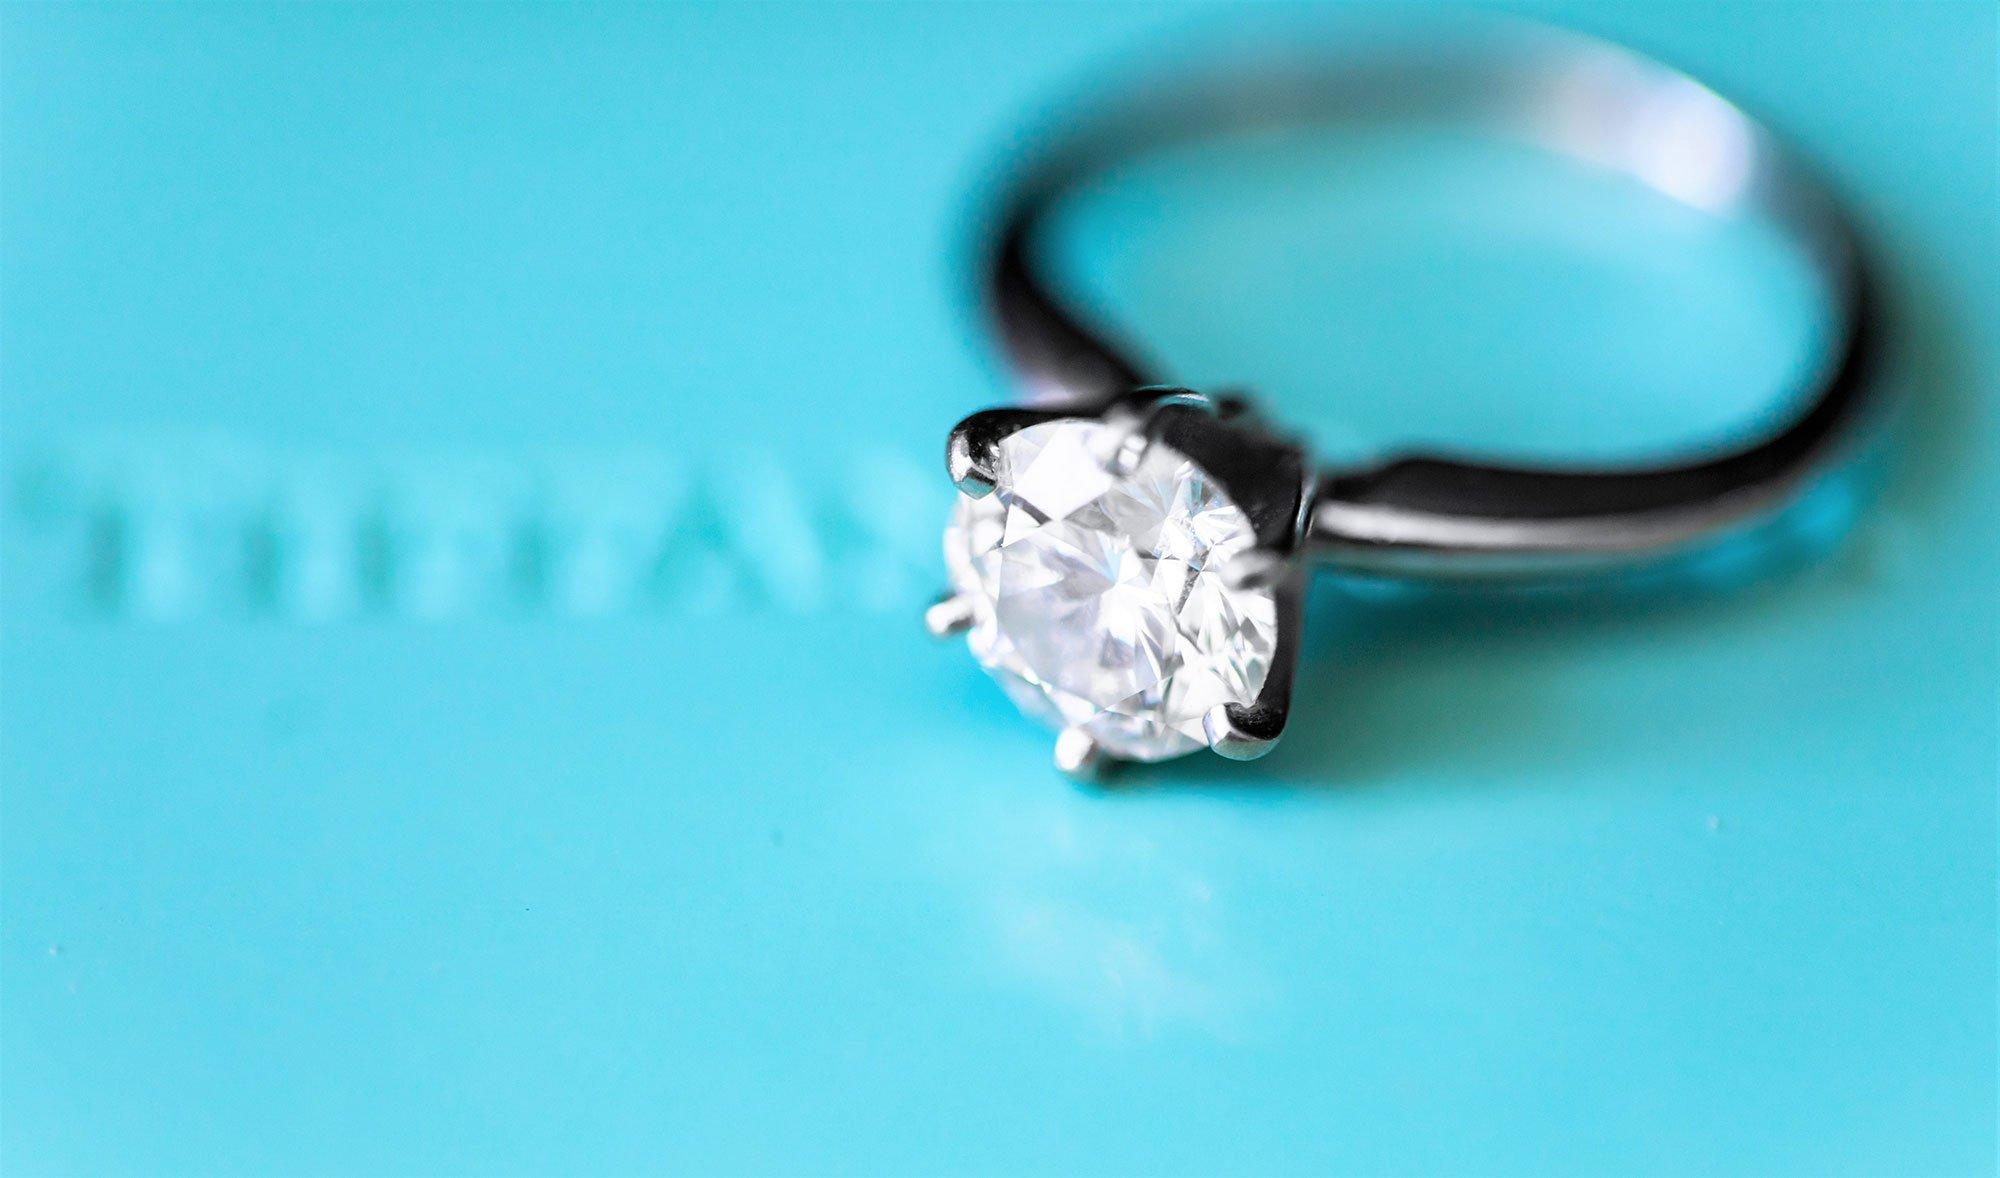 Jewellery Engagement Ring Insurance Bryson Insurance Personal Business Transportation